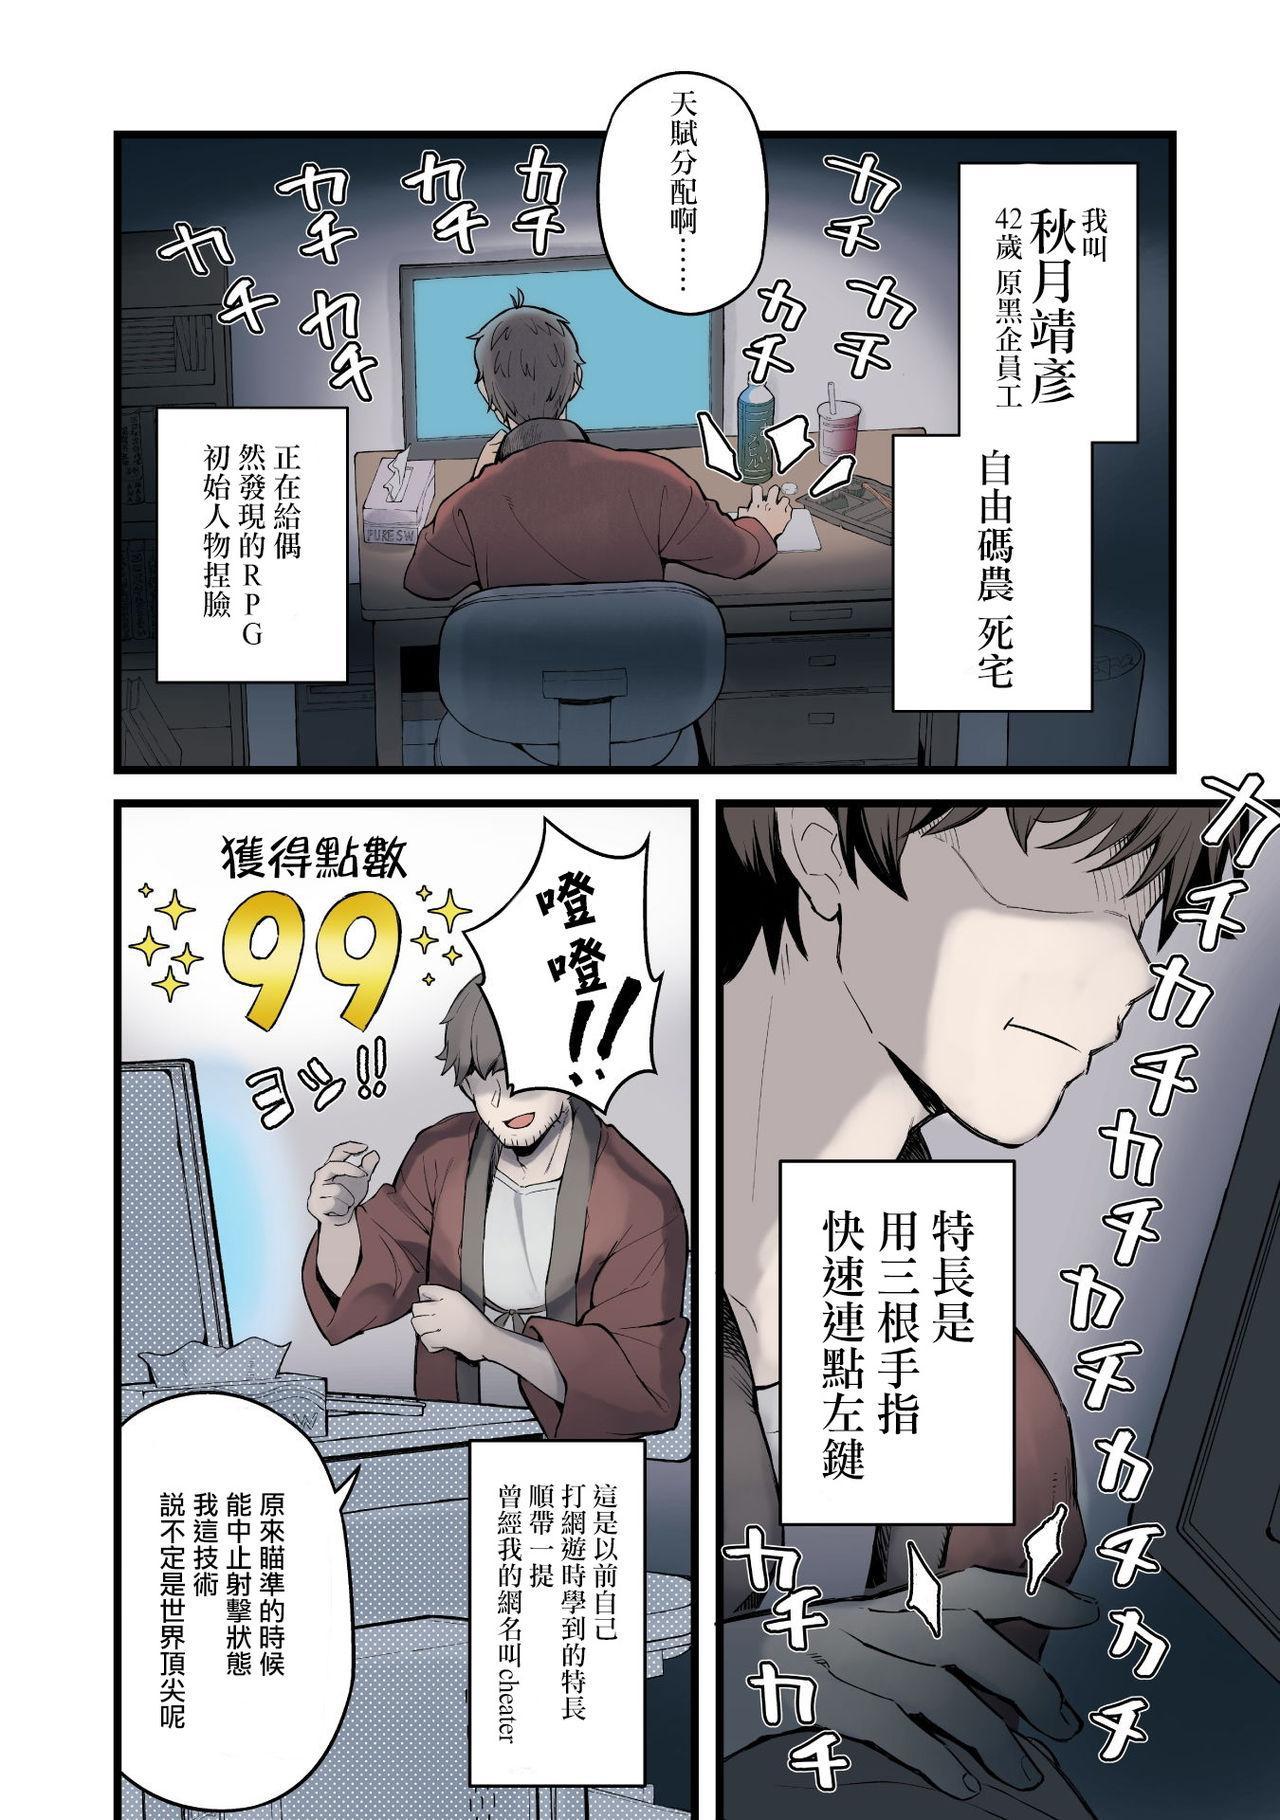 Eroi Skill de Isekai Musou Ch. 1 6